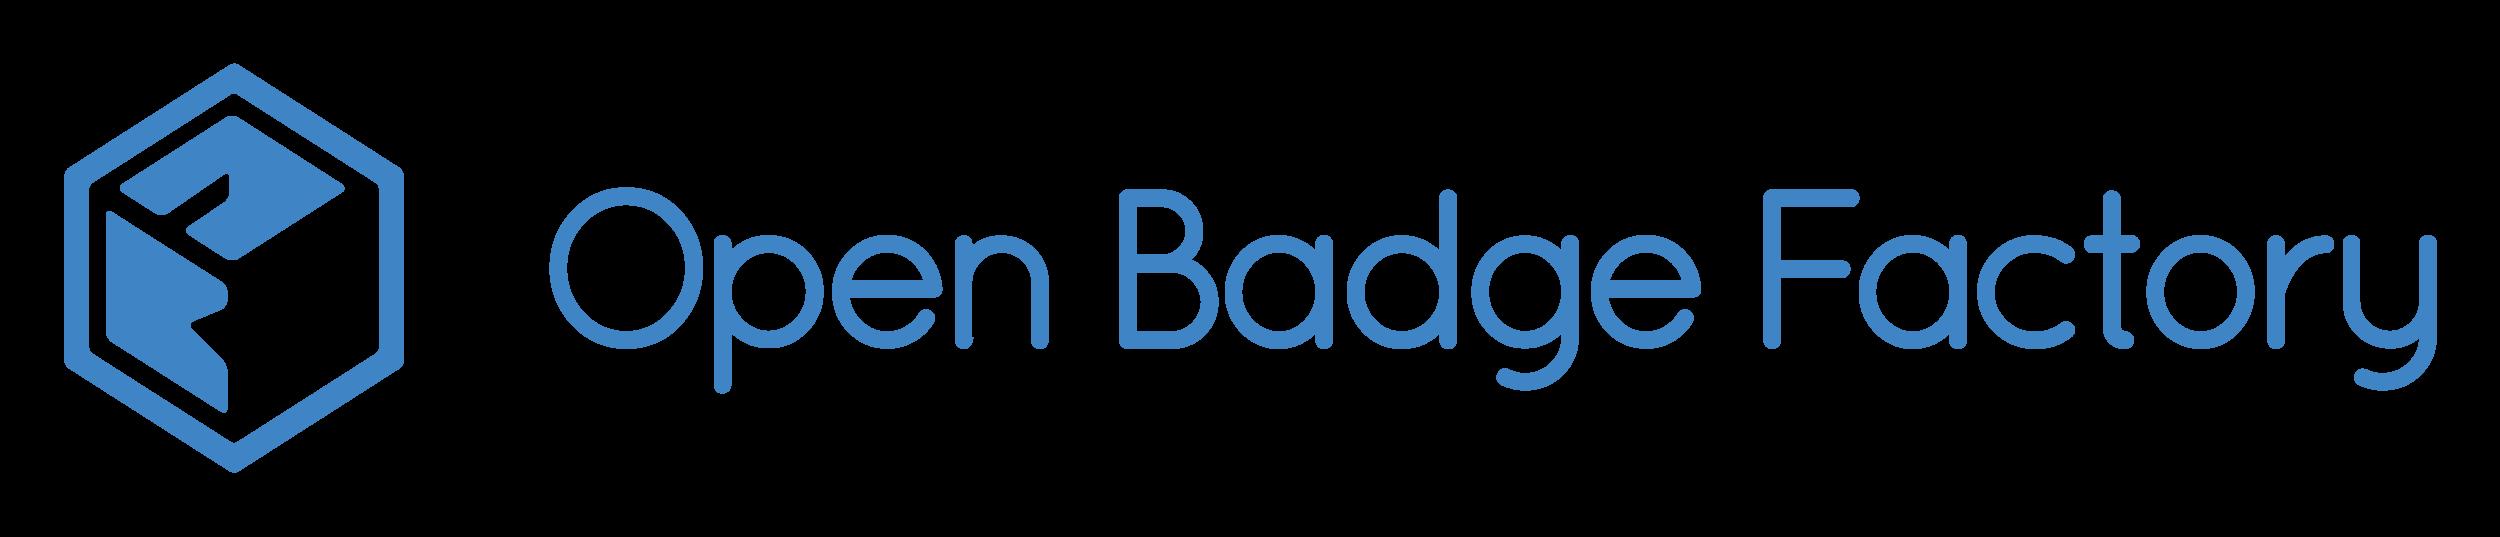 logo entreprise OBF